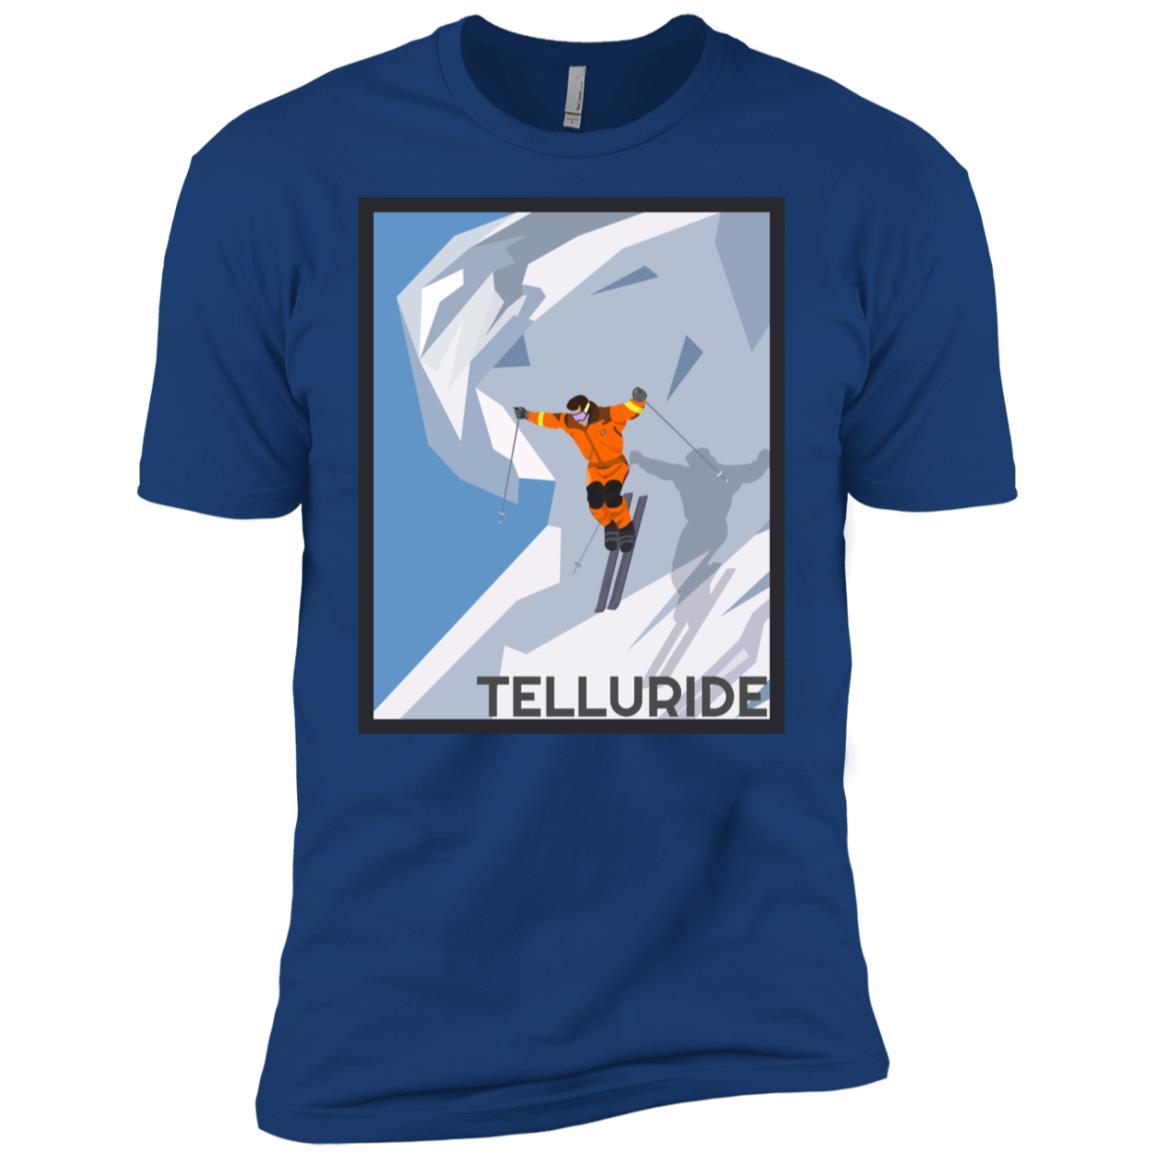 Telluride, Colorado Vintage Ski Poster Men Short Sleeve T-Shirt